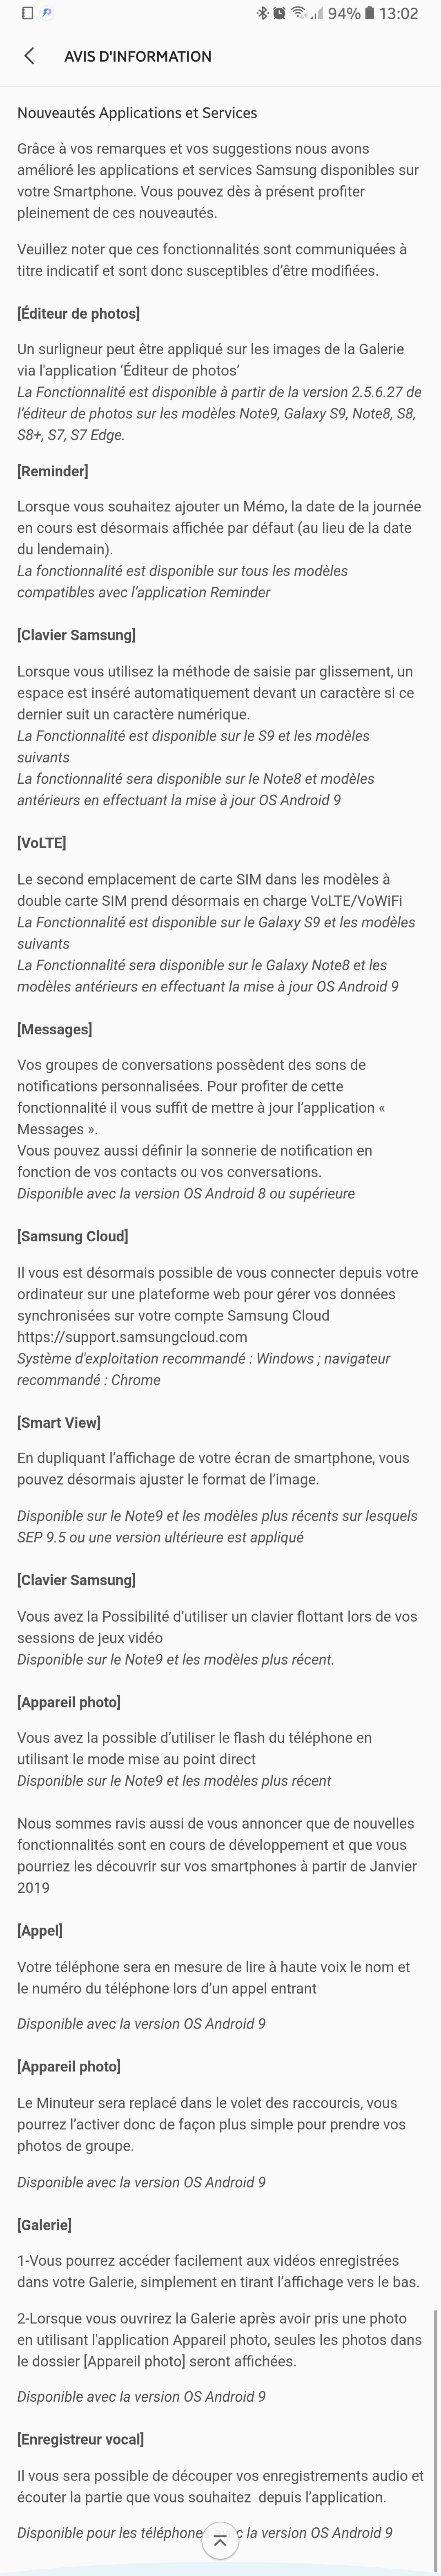 Samsung FR - MàJ Android 9.0 Pie